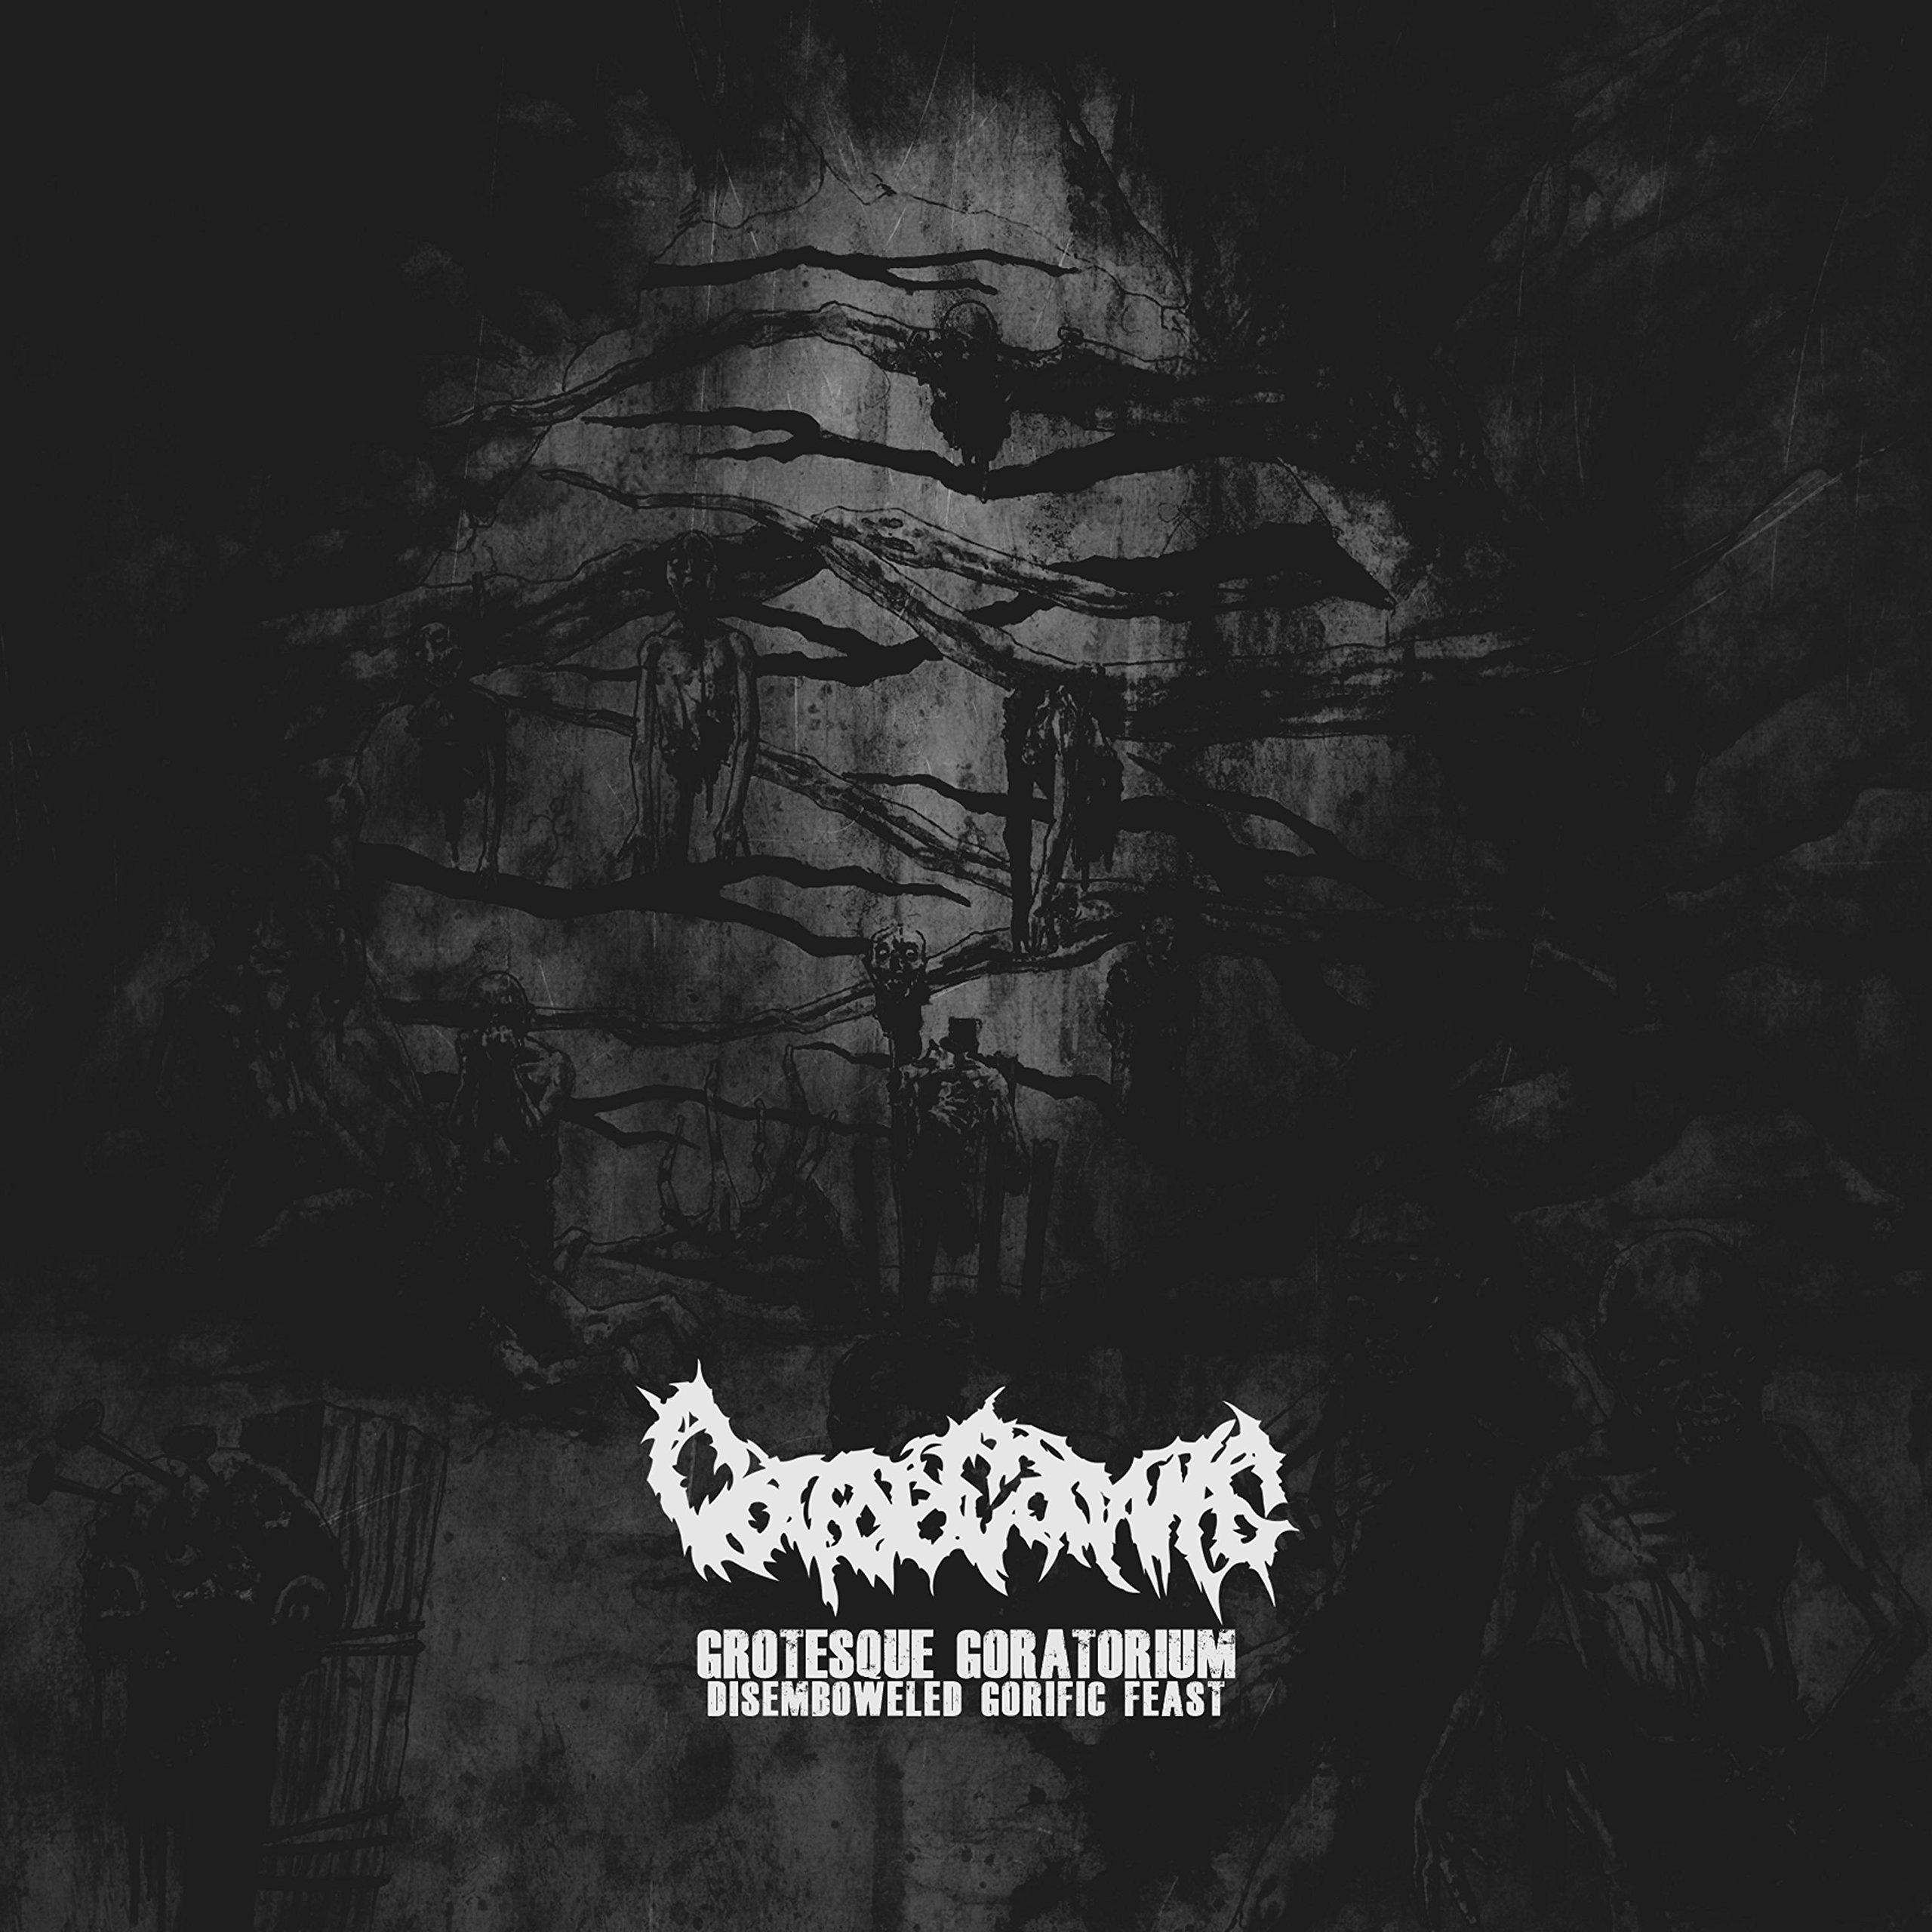 Corpse Carving – Grotesque Goratorium: Disemboweled Gorific Feast (2005) [FLAC]